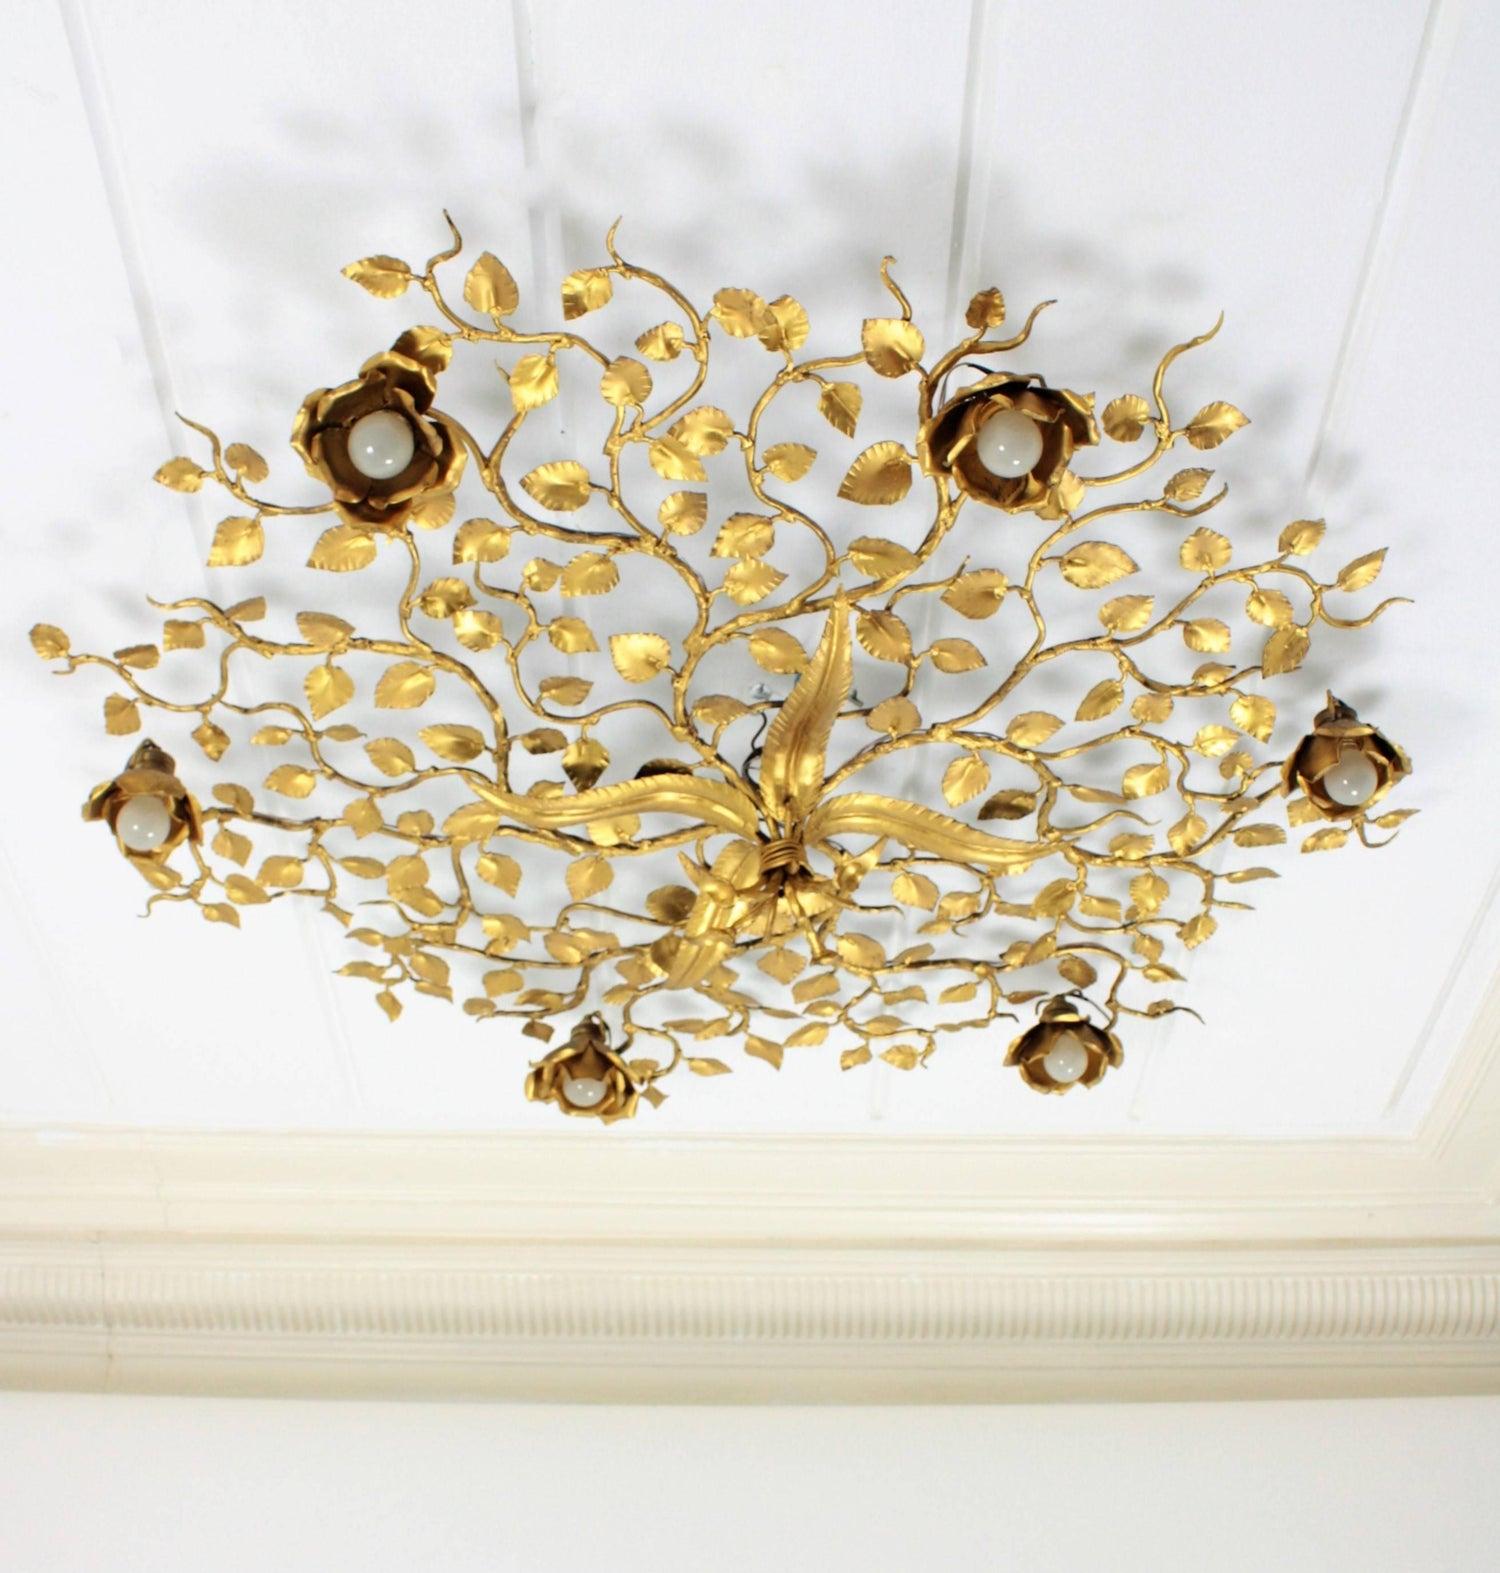 Spanish large gilt iron ornate flower bush ceiling light fixture or spanish large gilt iron ornate flower bush ceiling light fixture or wall light at 1stdibs arubaitofo Image collections